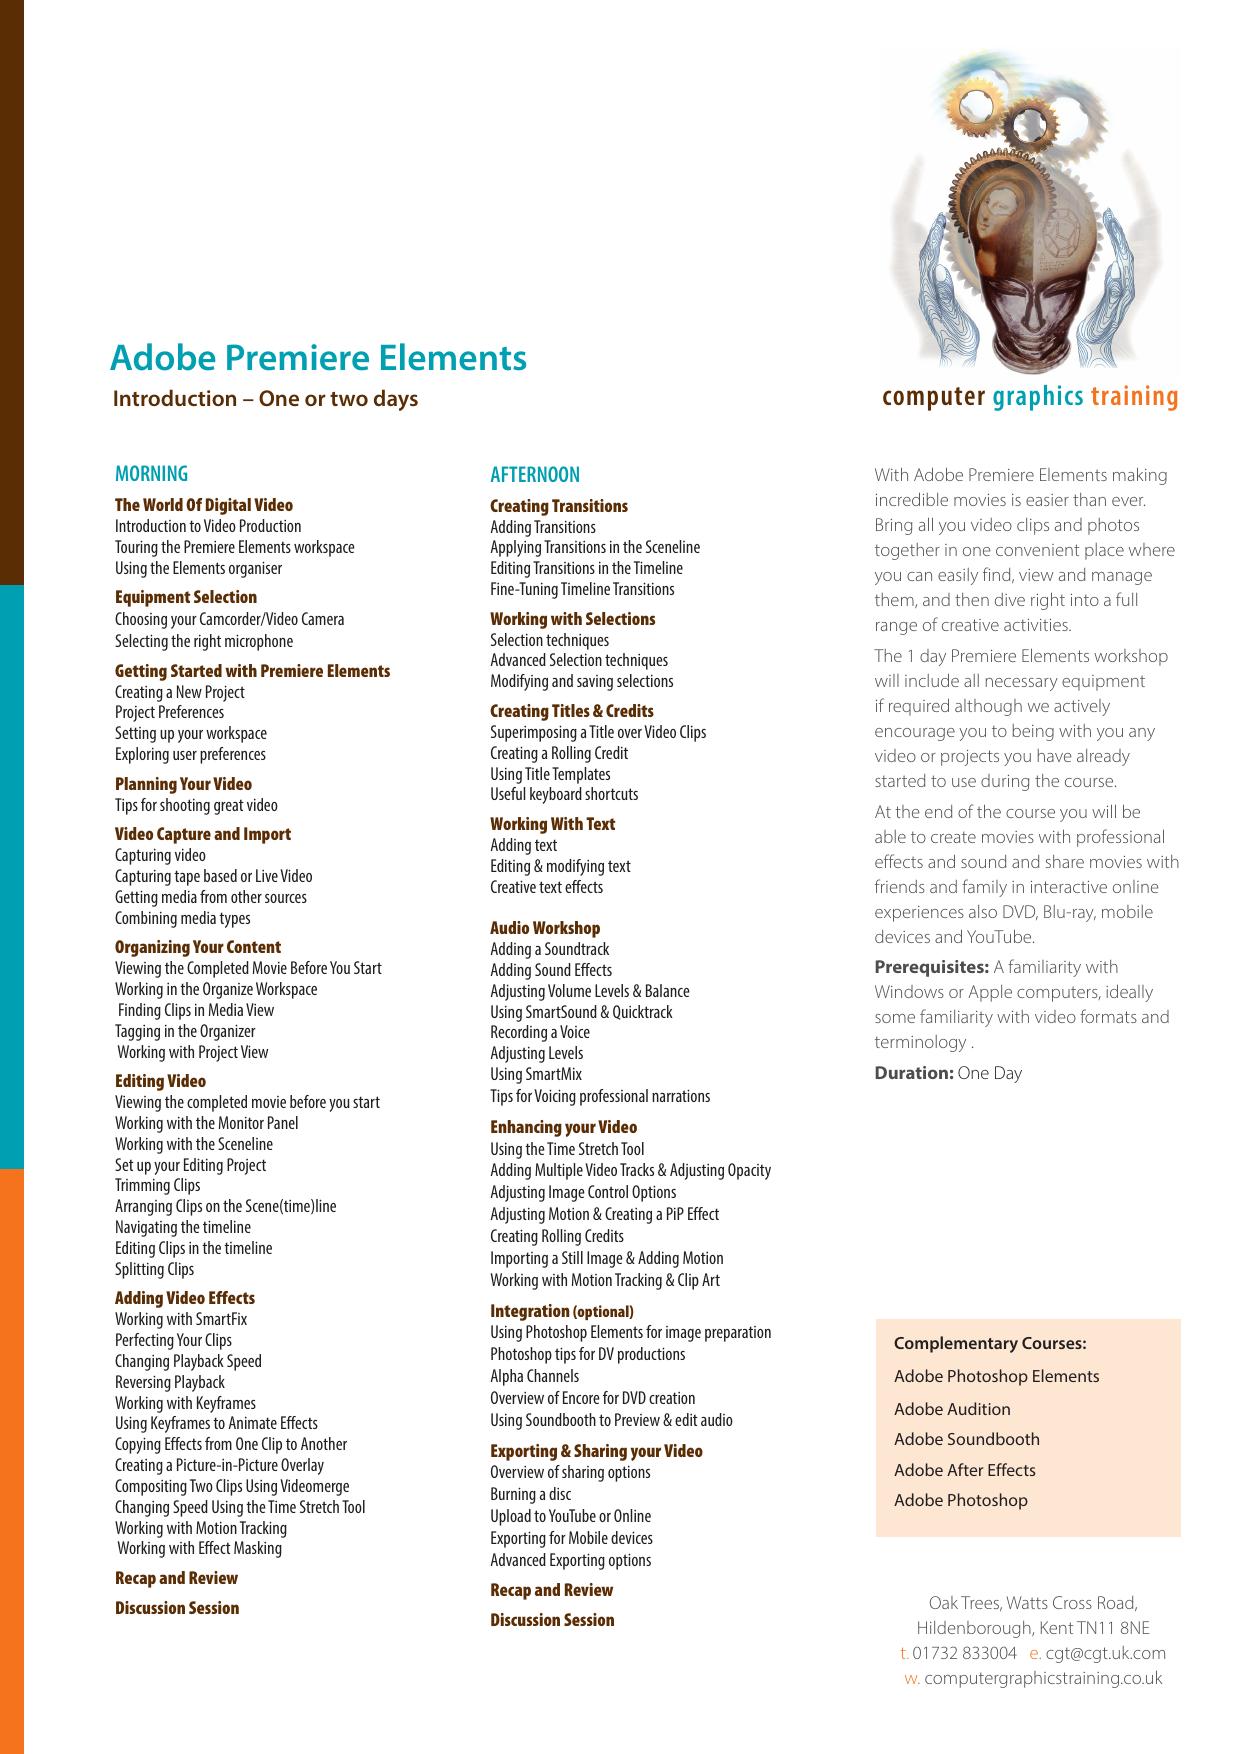 Adobe Premiere Elements - Computer Graphics Training